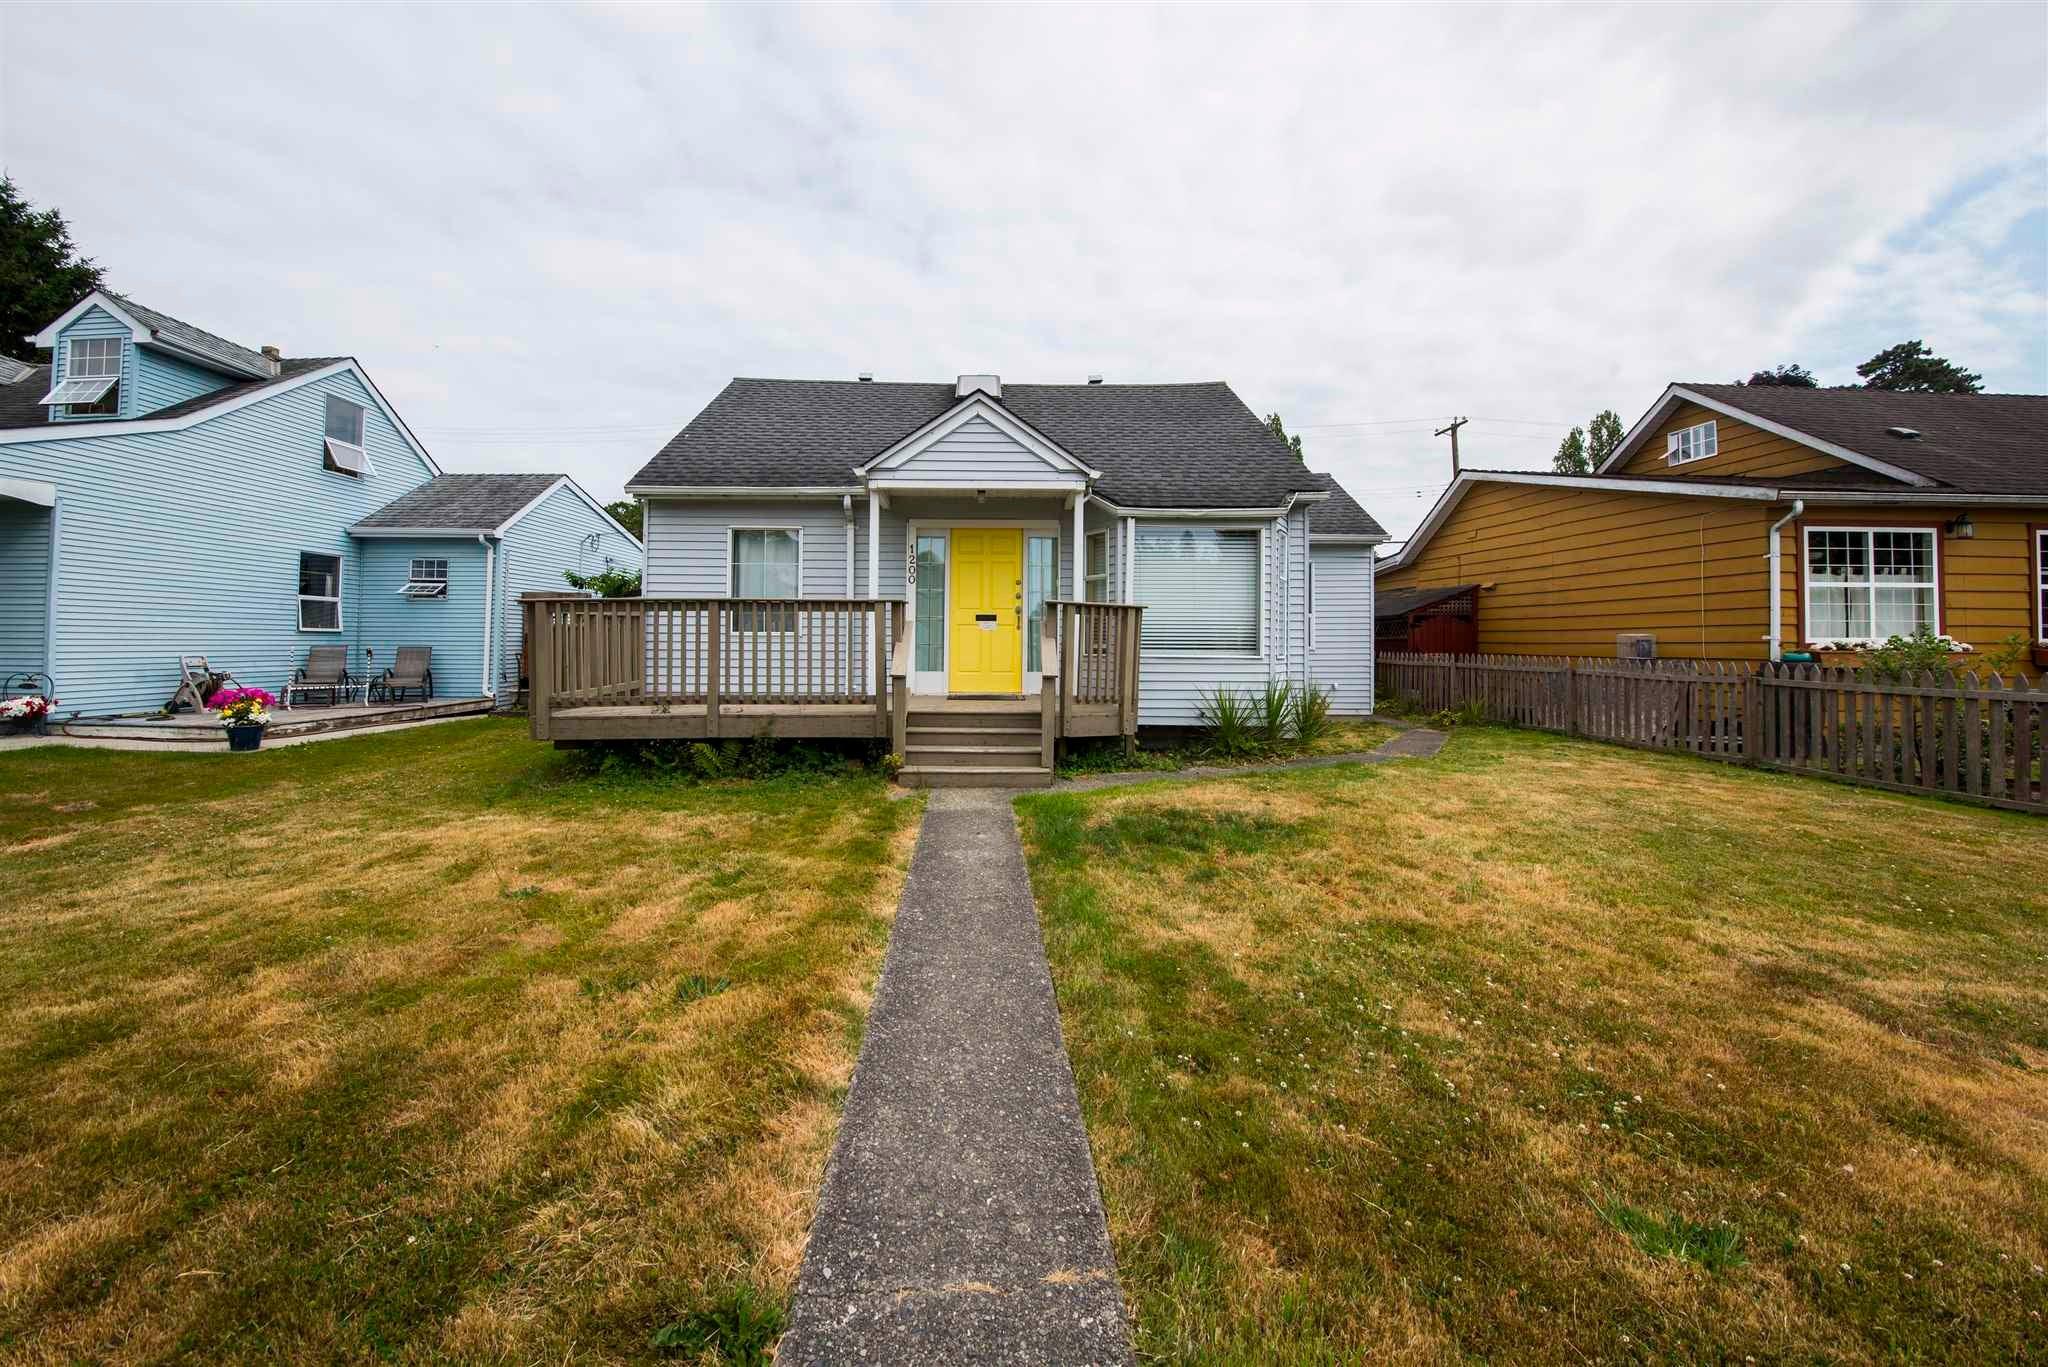 1200 DOUGLAS CRESCENT - Sea Island House/Single Family for sale, 3 Bedrooms (R2601587)